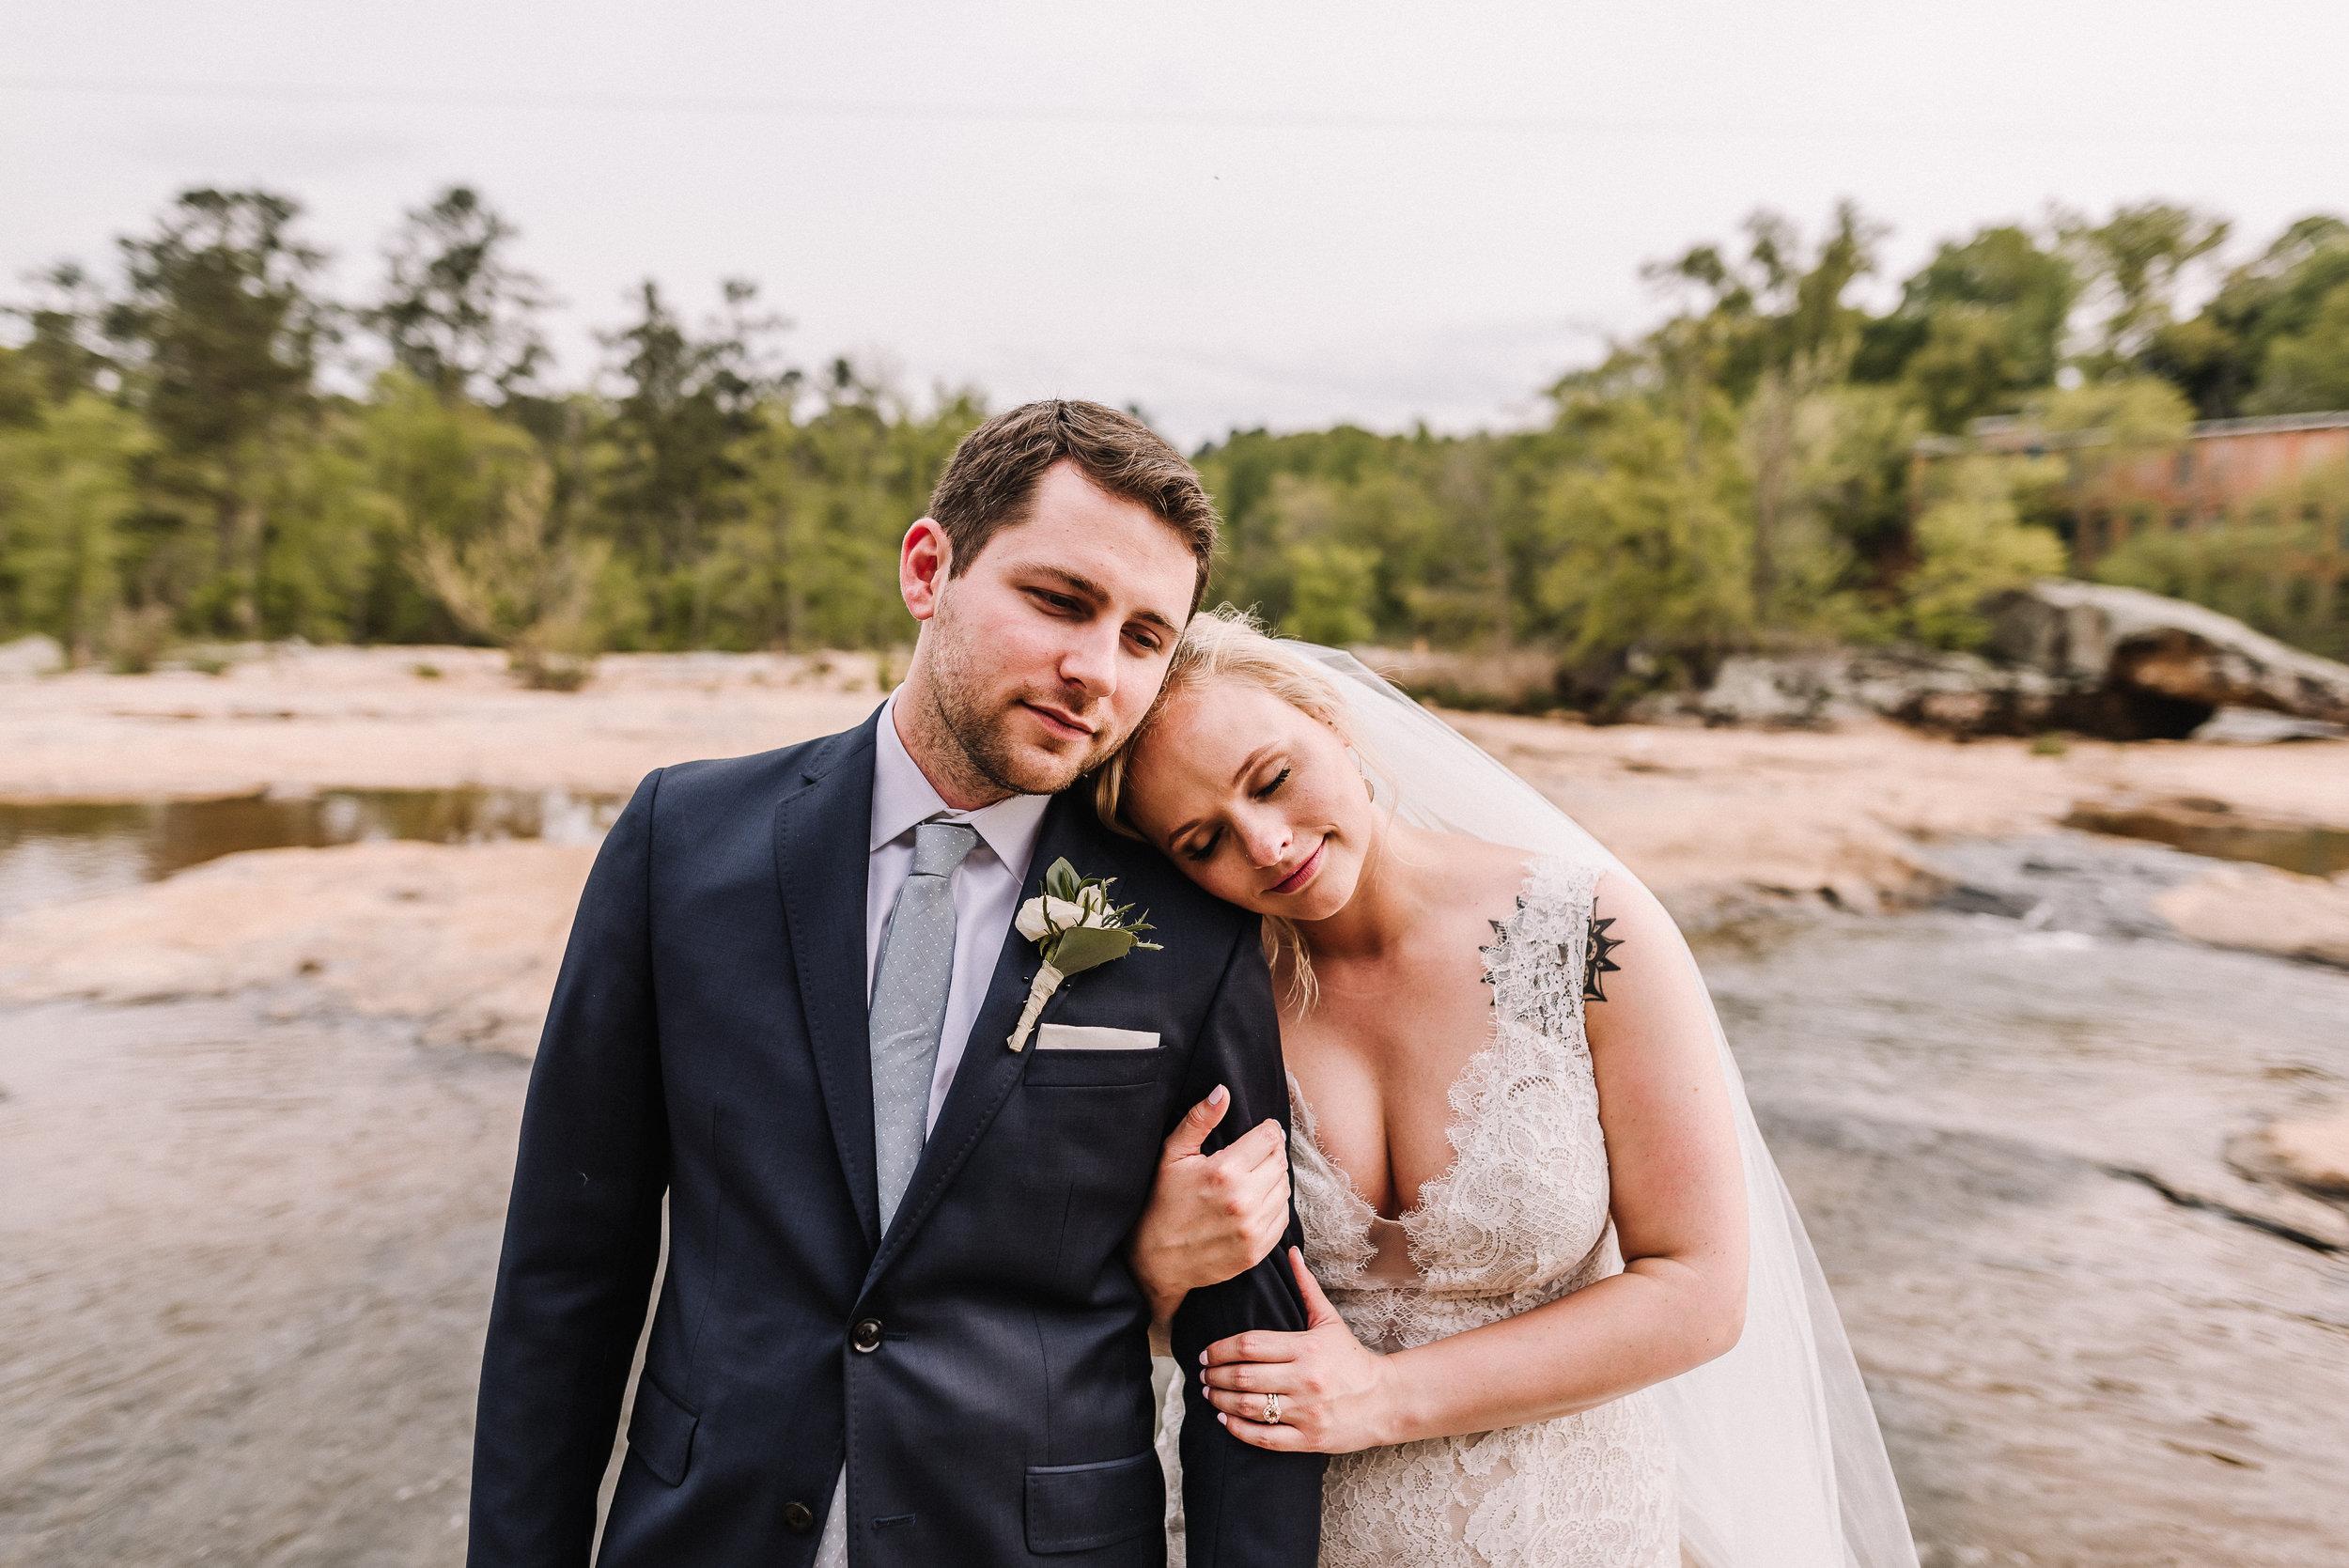 Morgan Wedding_Mill at Yellow River_Ashley Benham Photography-921.jpg